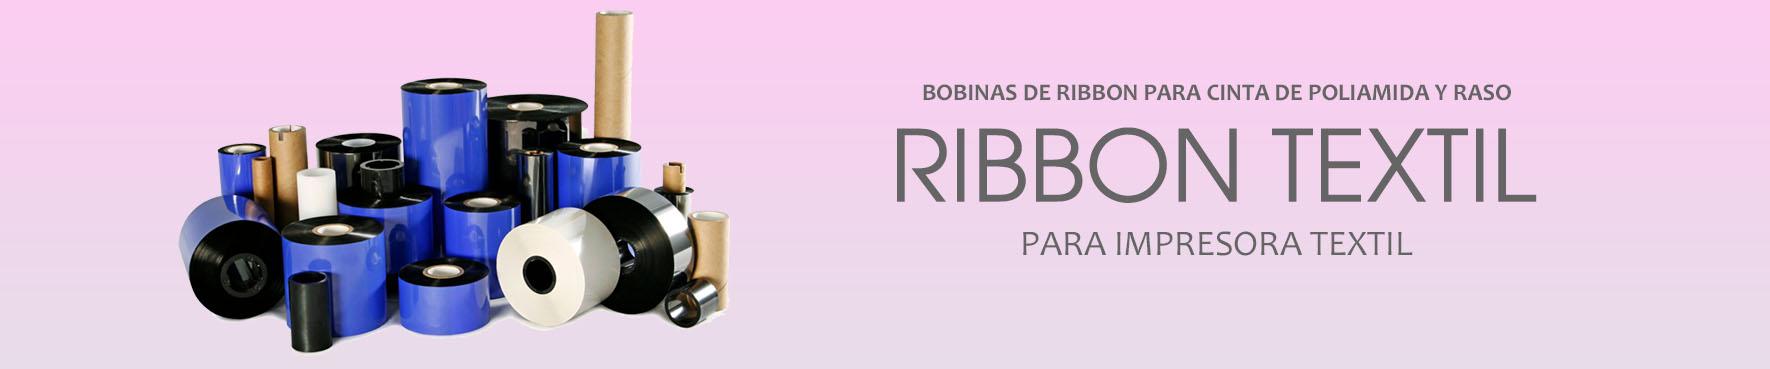 banner-ribbon textil